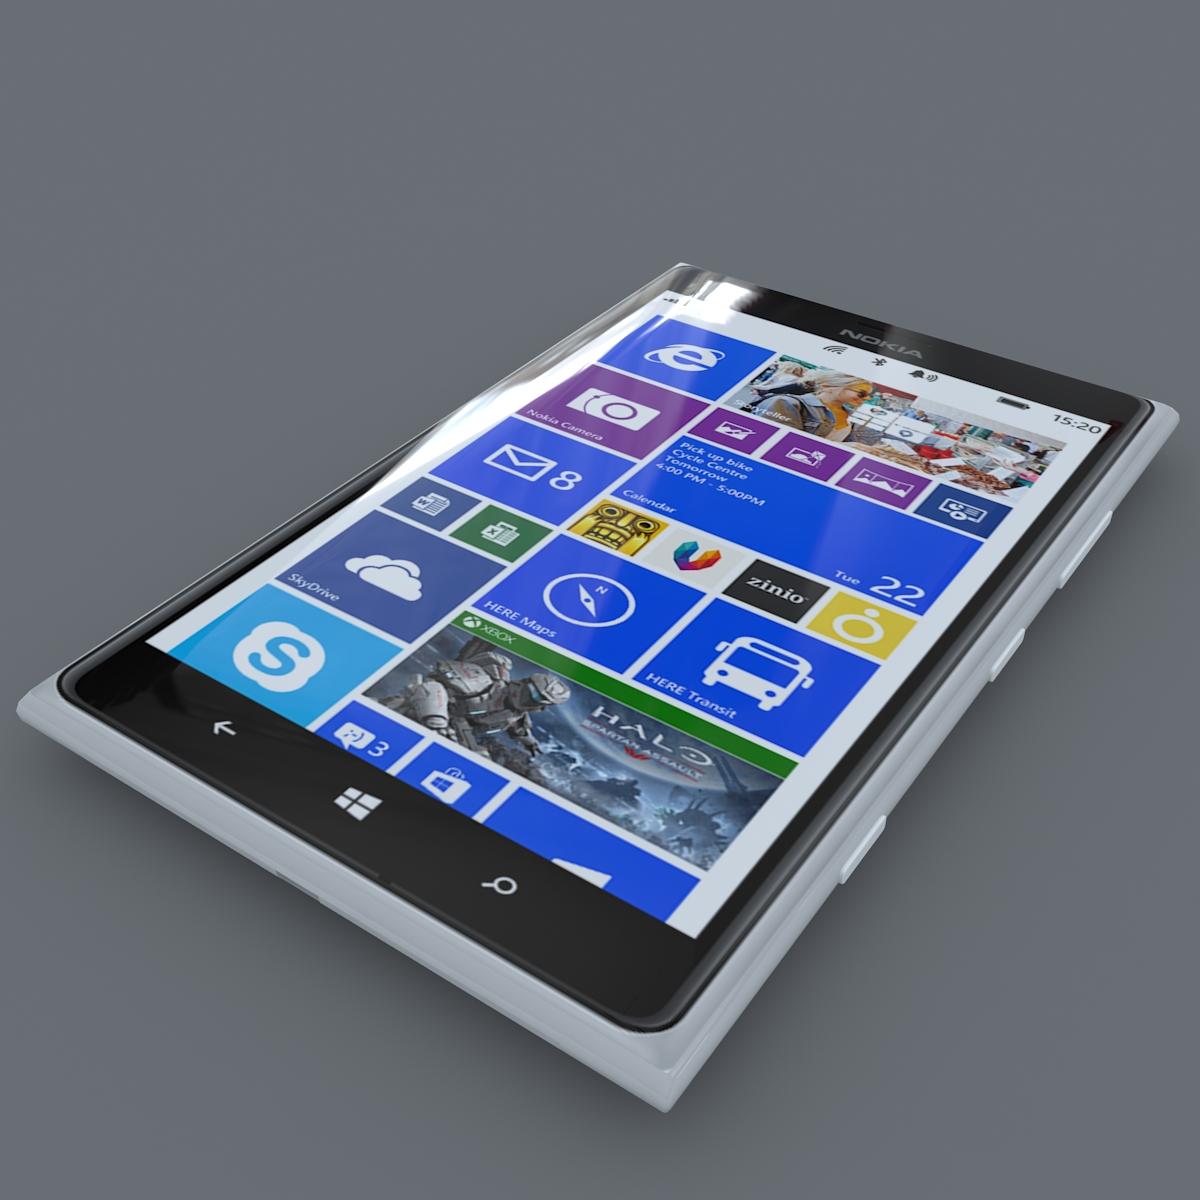 Nokia lumia 1520 бела 3d модел максимум fbx c4d lxo ma mb obj 158421